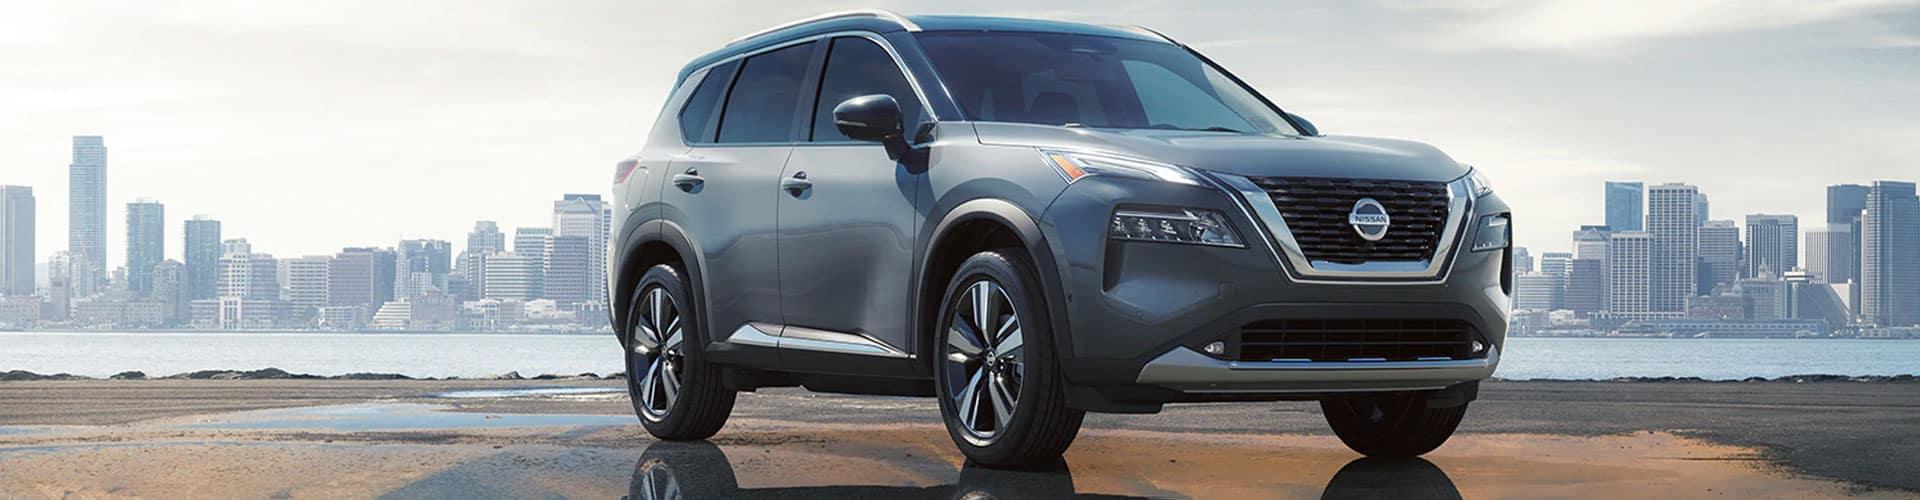 2021-Nissan-Rogue-min